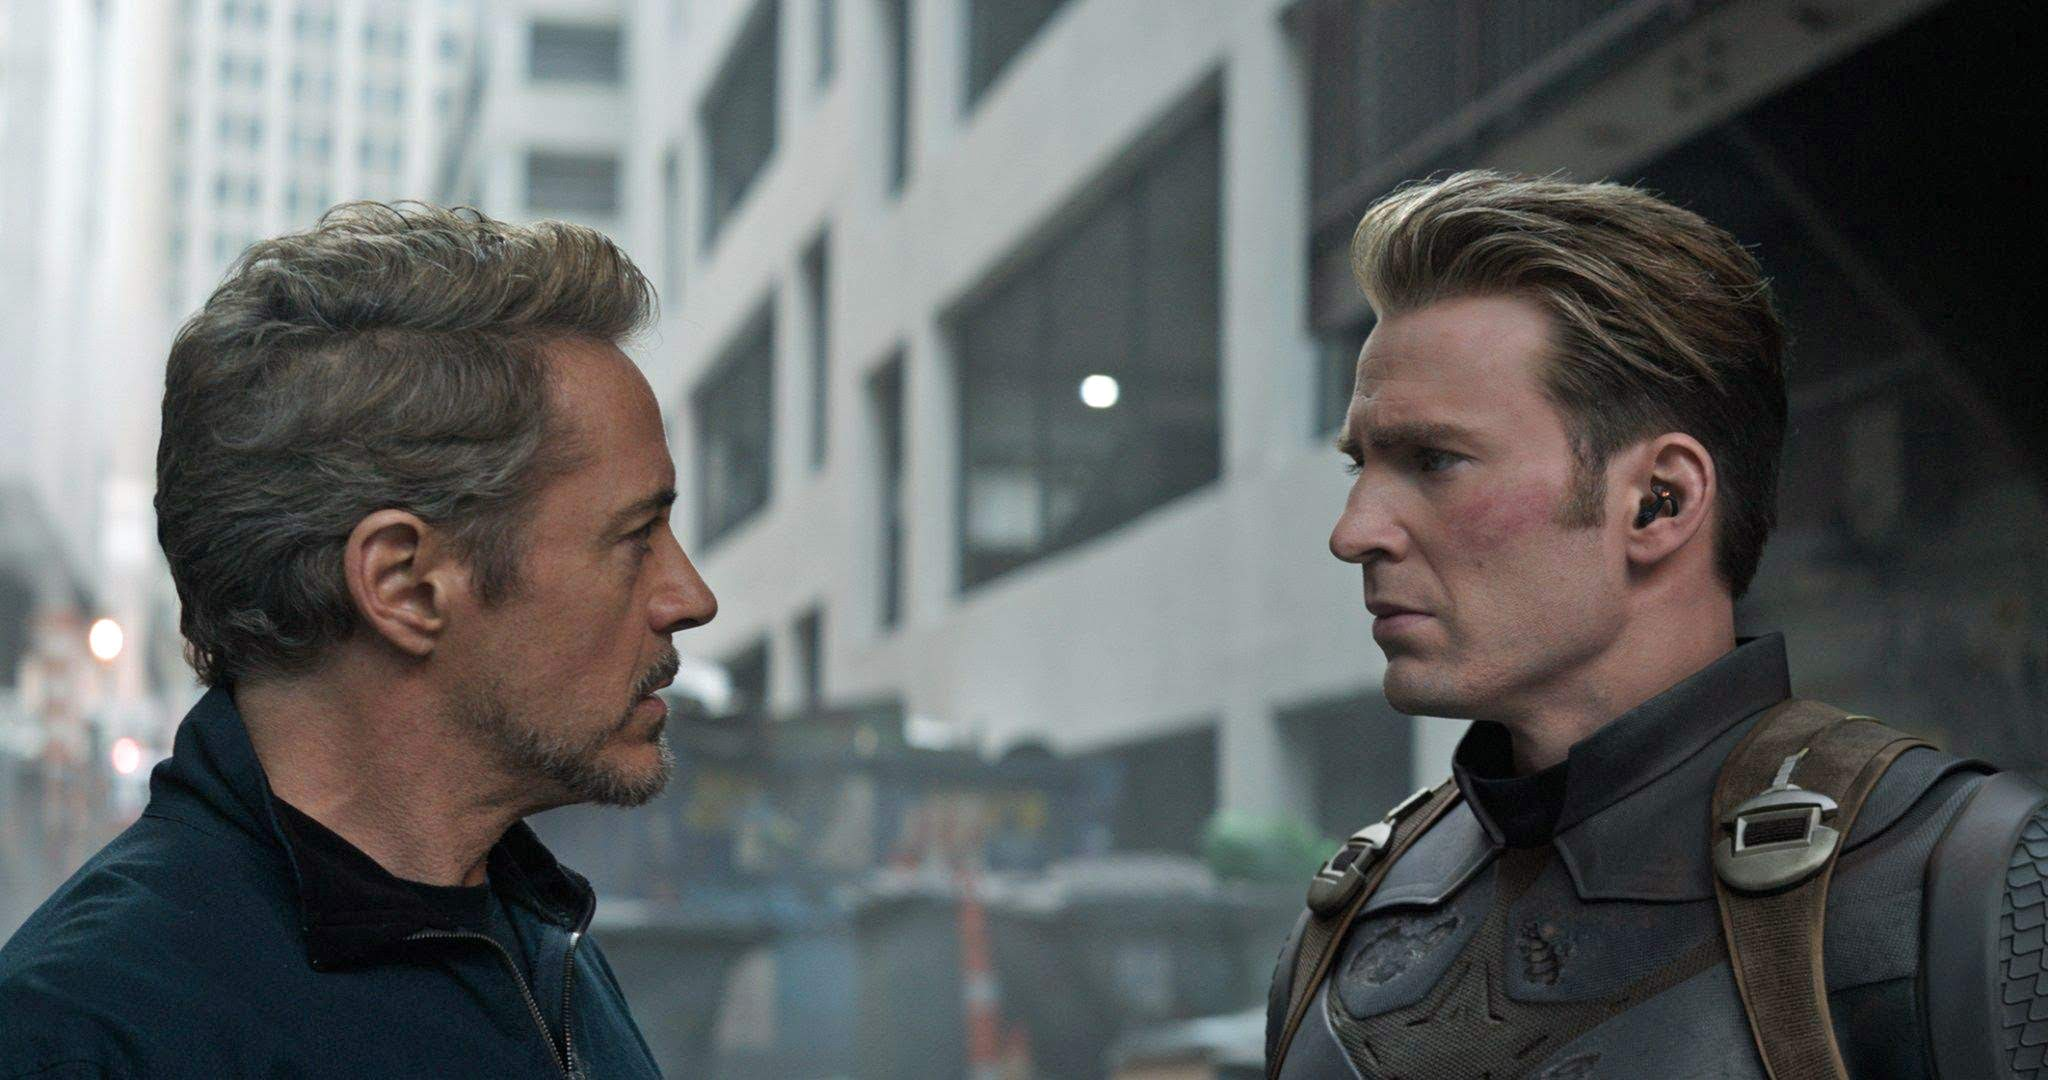 Avengers Endgame:【ネタバレ無し】「アベンジャーズ」ファンに朗報 ! !、約3時間1分の大作「エンドゲーム」を自宅でゆっくりとくり返し観ることができる配信開始日が決定 ! !